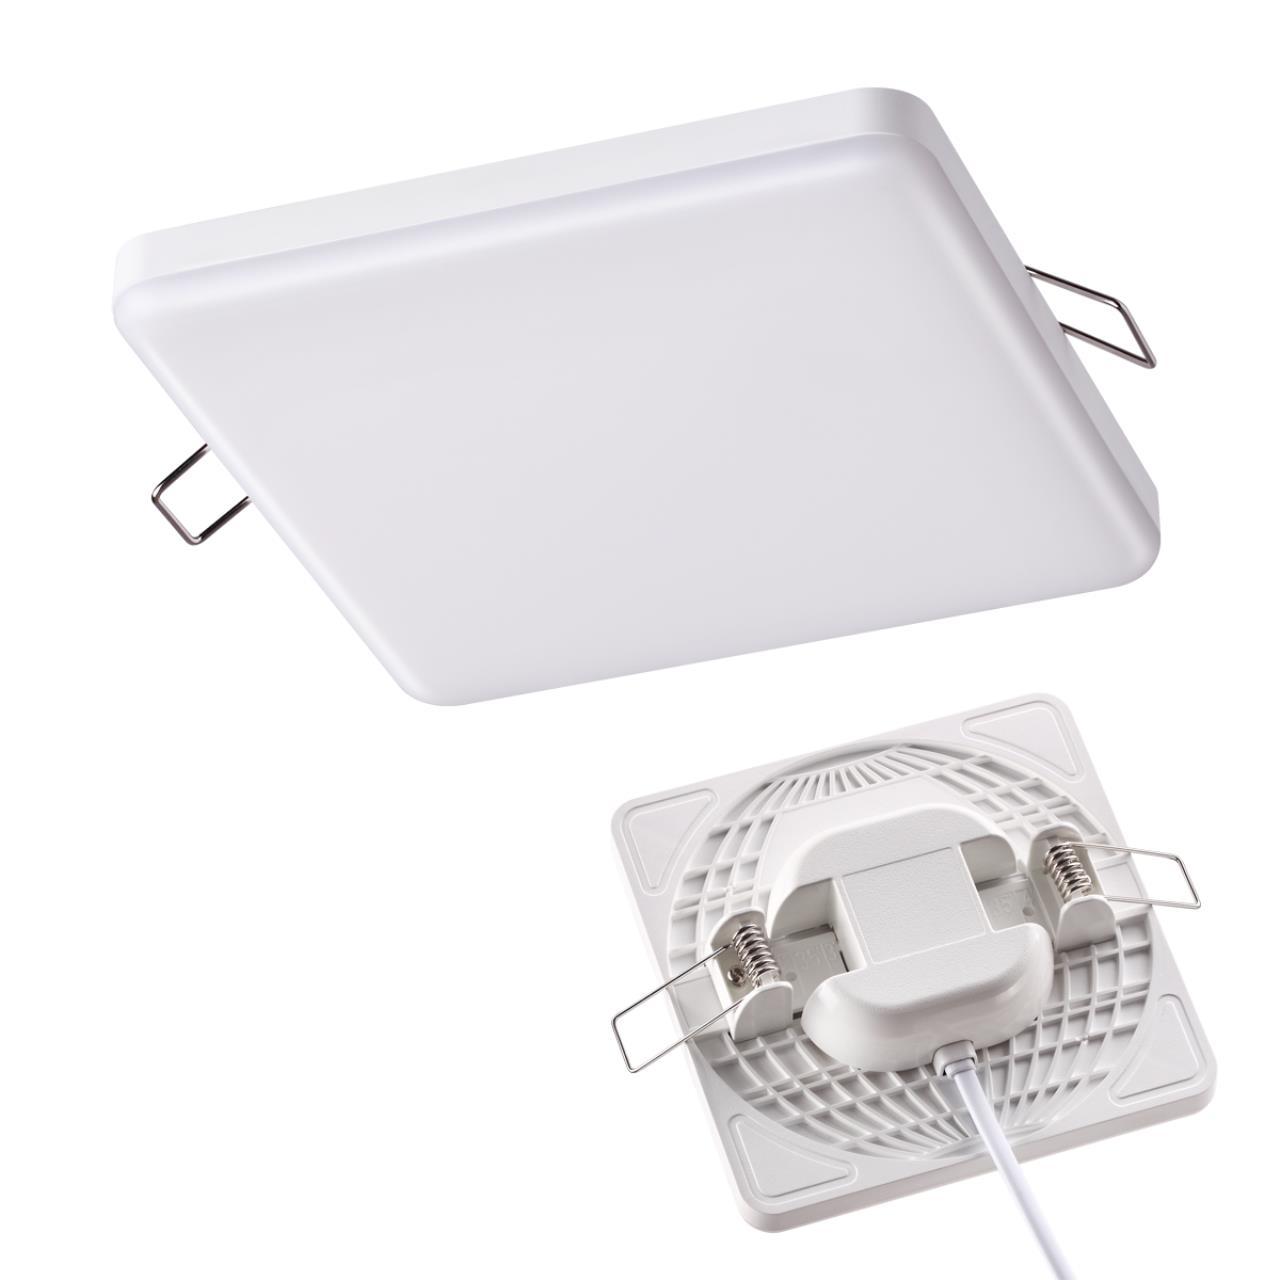 358149 SPOT NT19 078 белый Встраиваемый светильник IP20 LED 3000K 18W 85 - 265V MOON